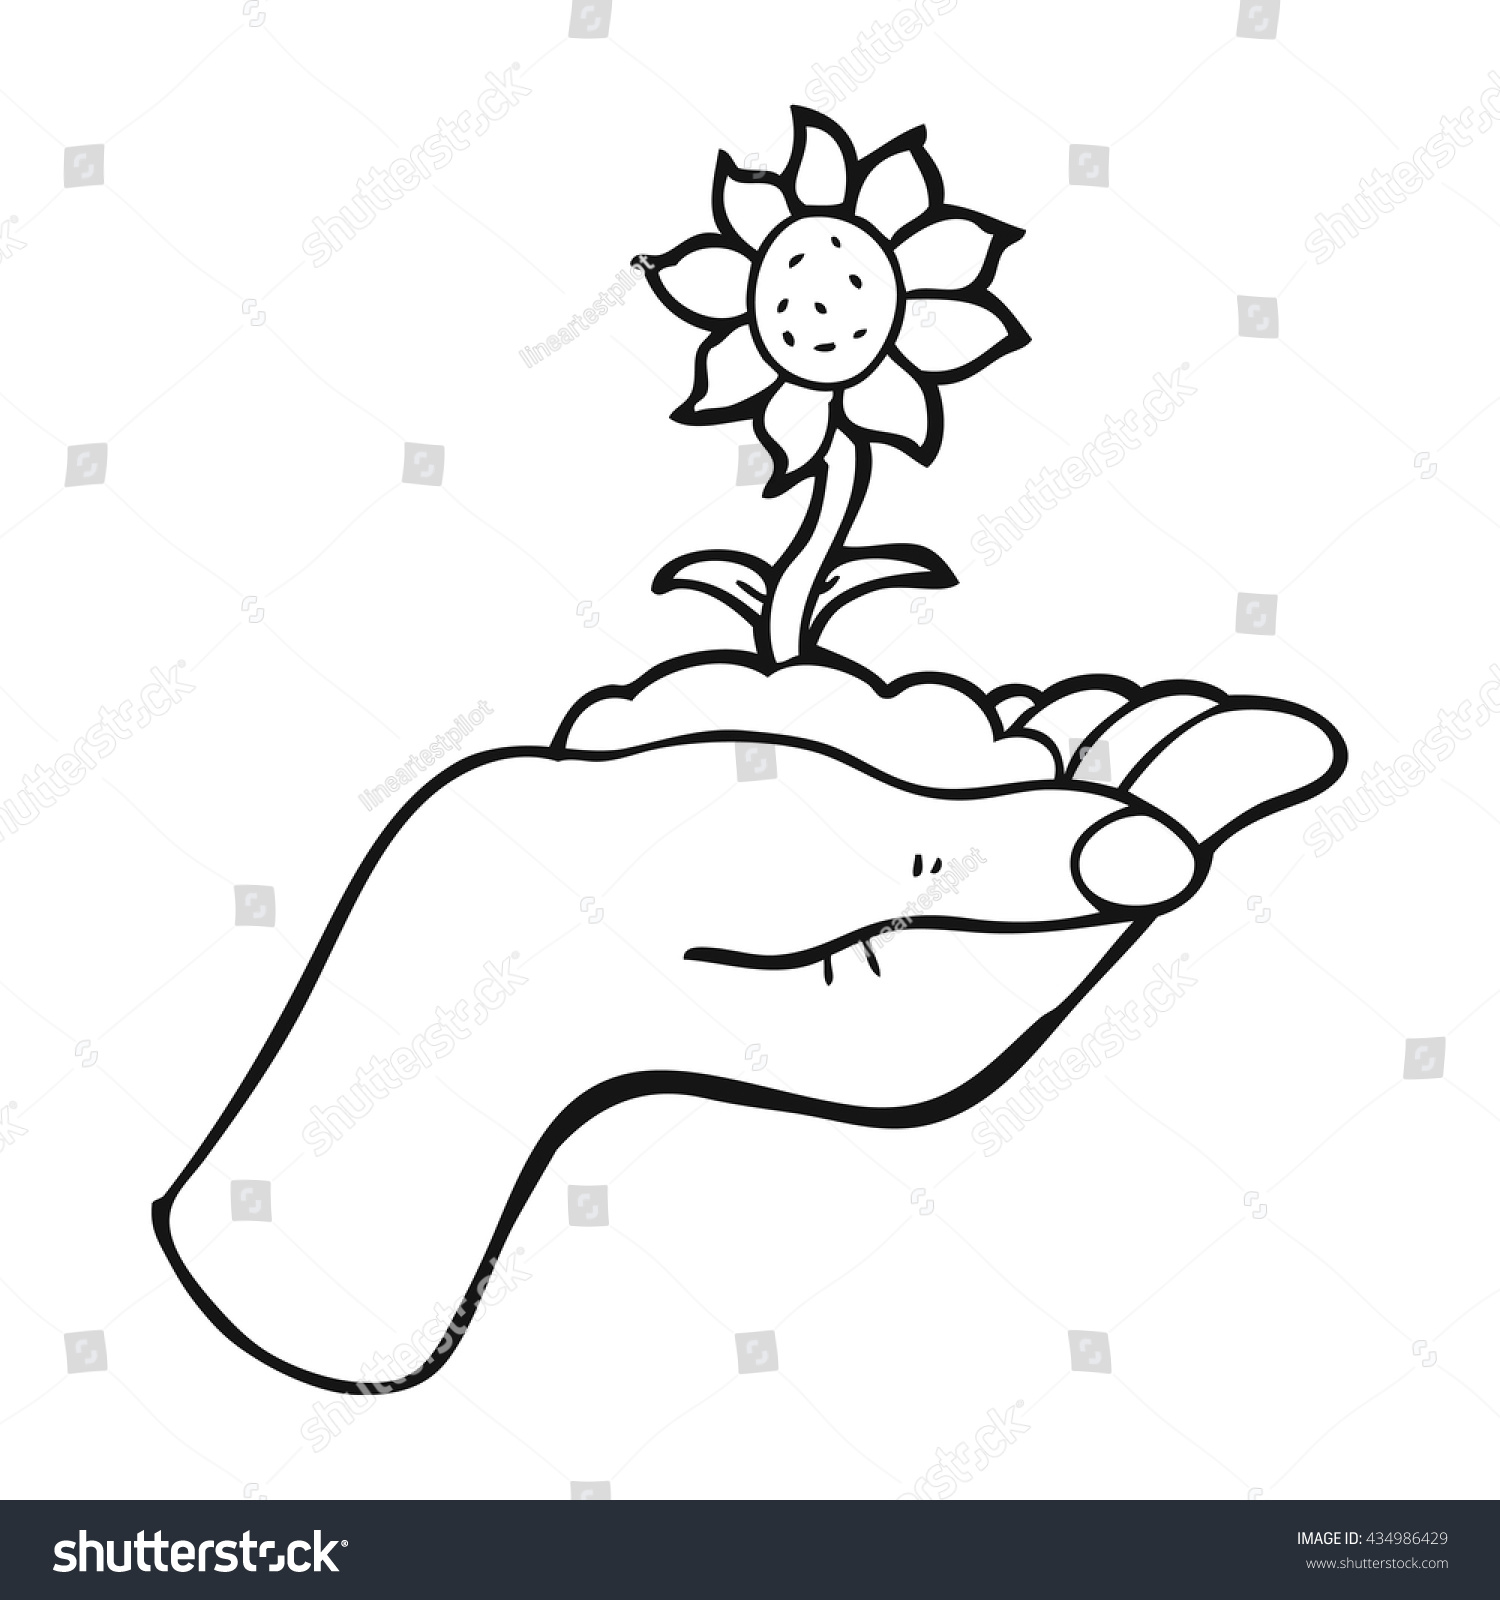 Freehand Drawn Black White Cartoon Flower Stock Vector Royalty Free